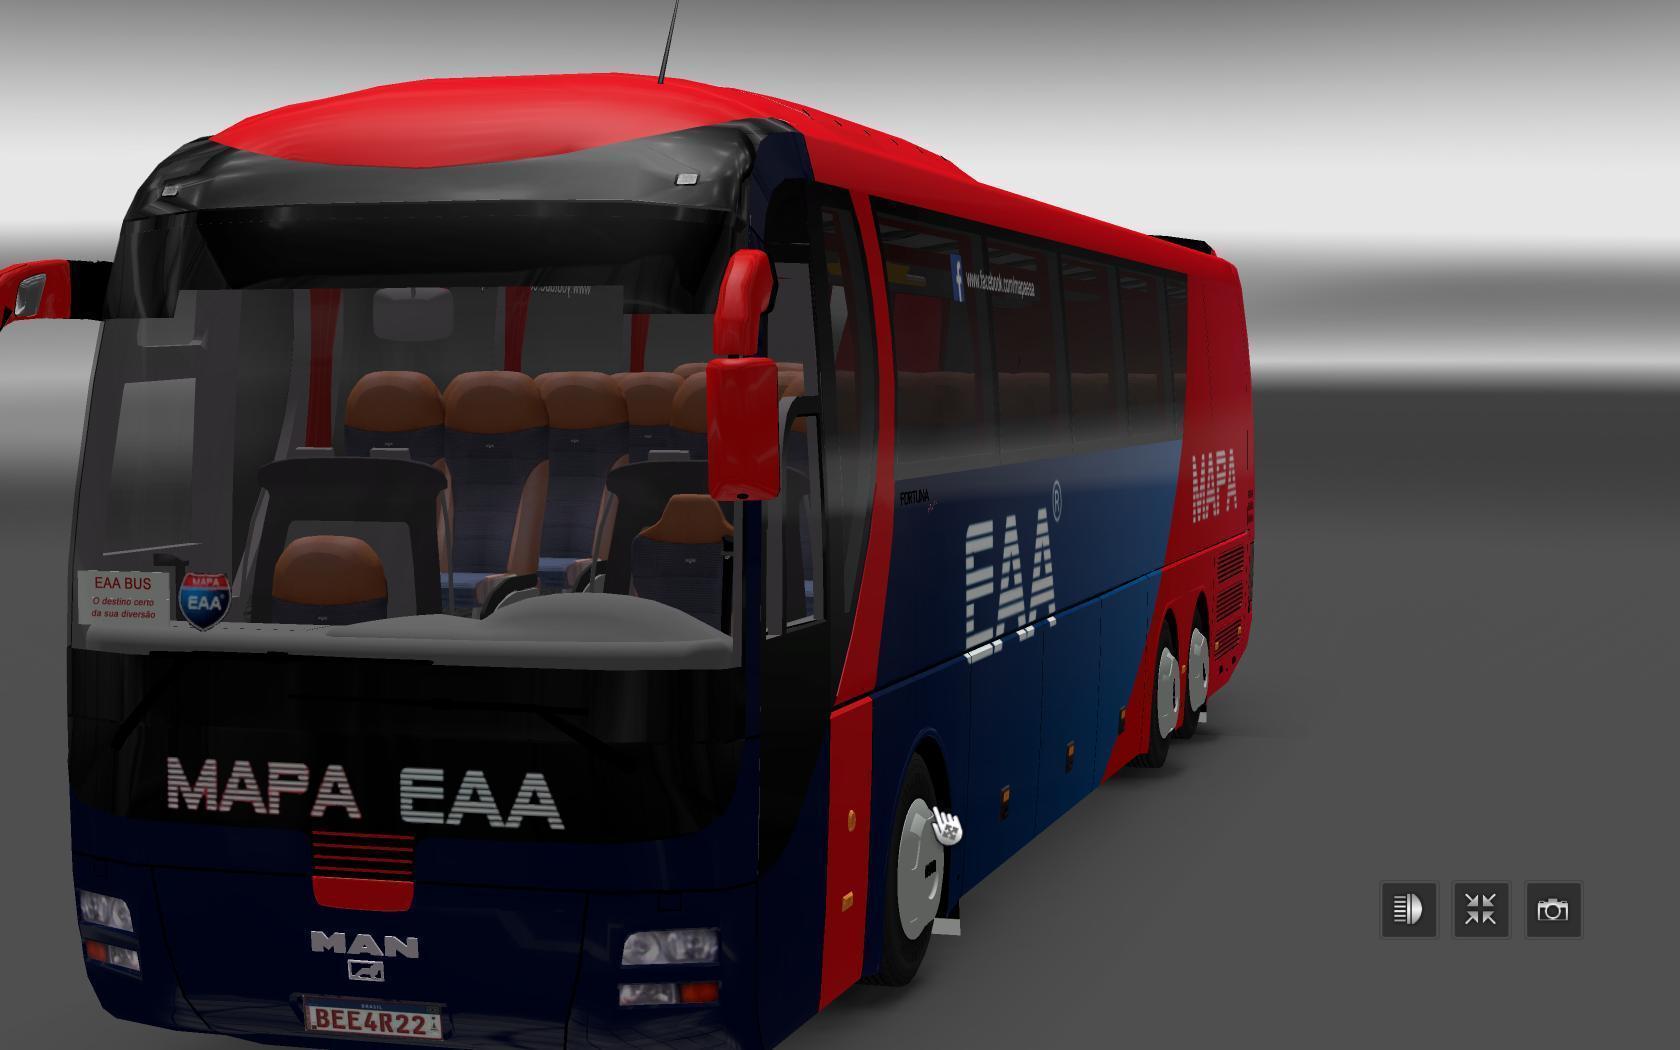 mapa-eaa-bus-v2-0-2-for-1-24_1